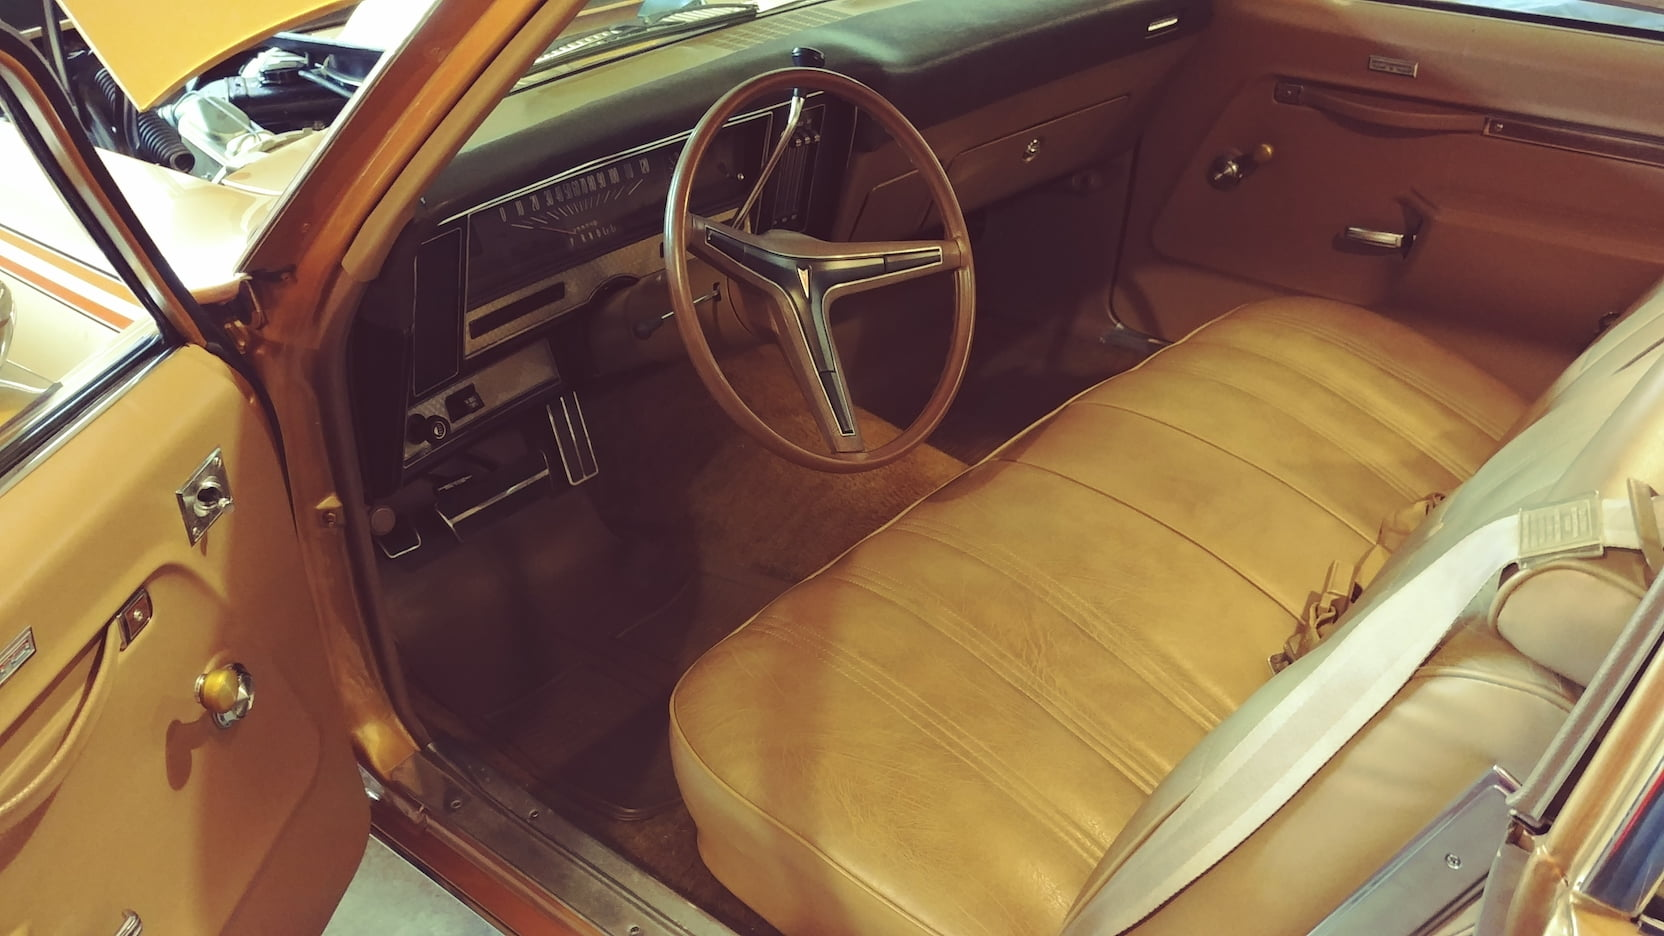 1974 Pontiac GTO bench seat